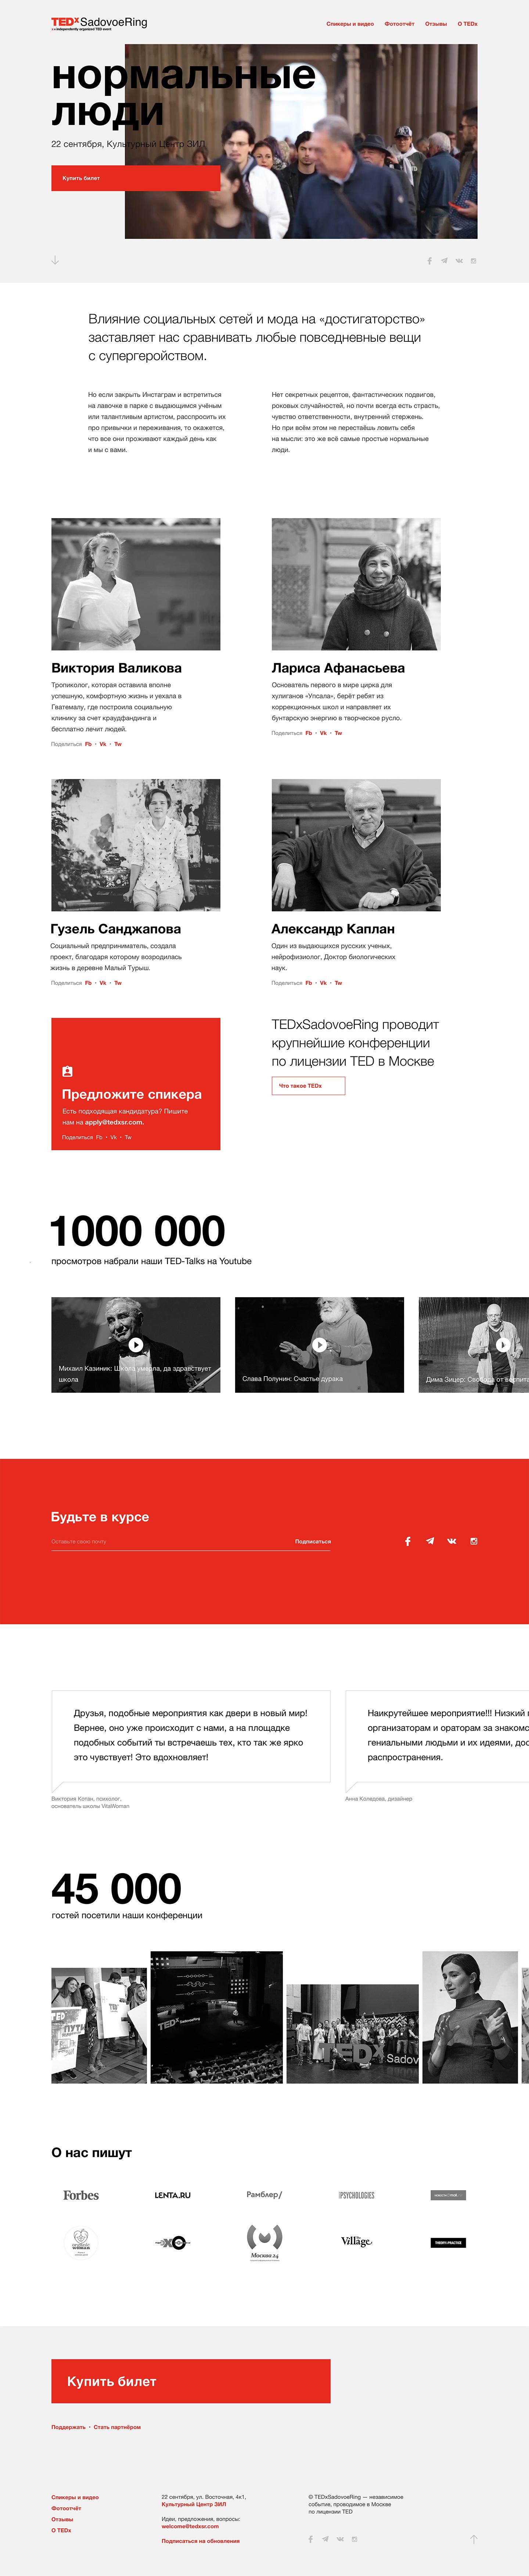 Tedxsr main desktop 1440